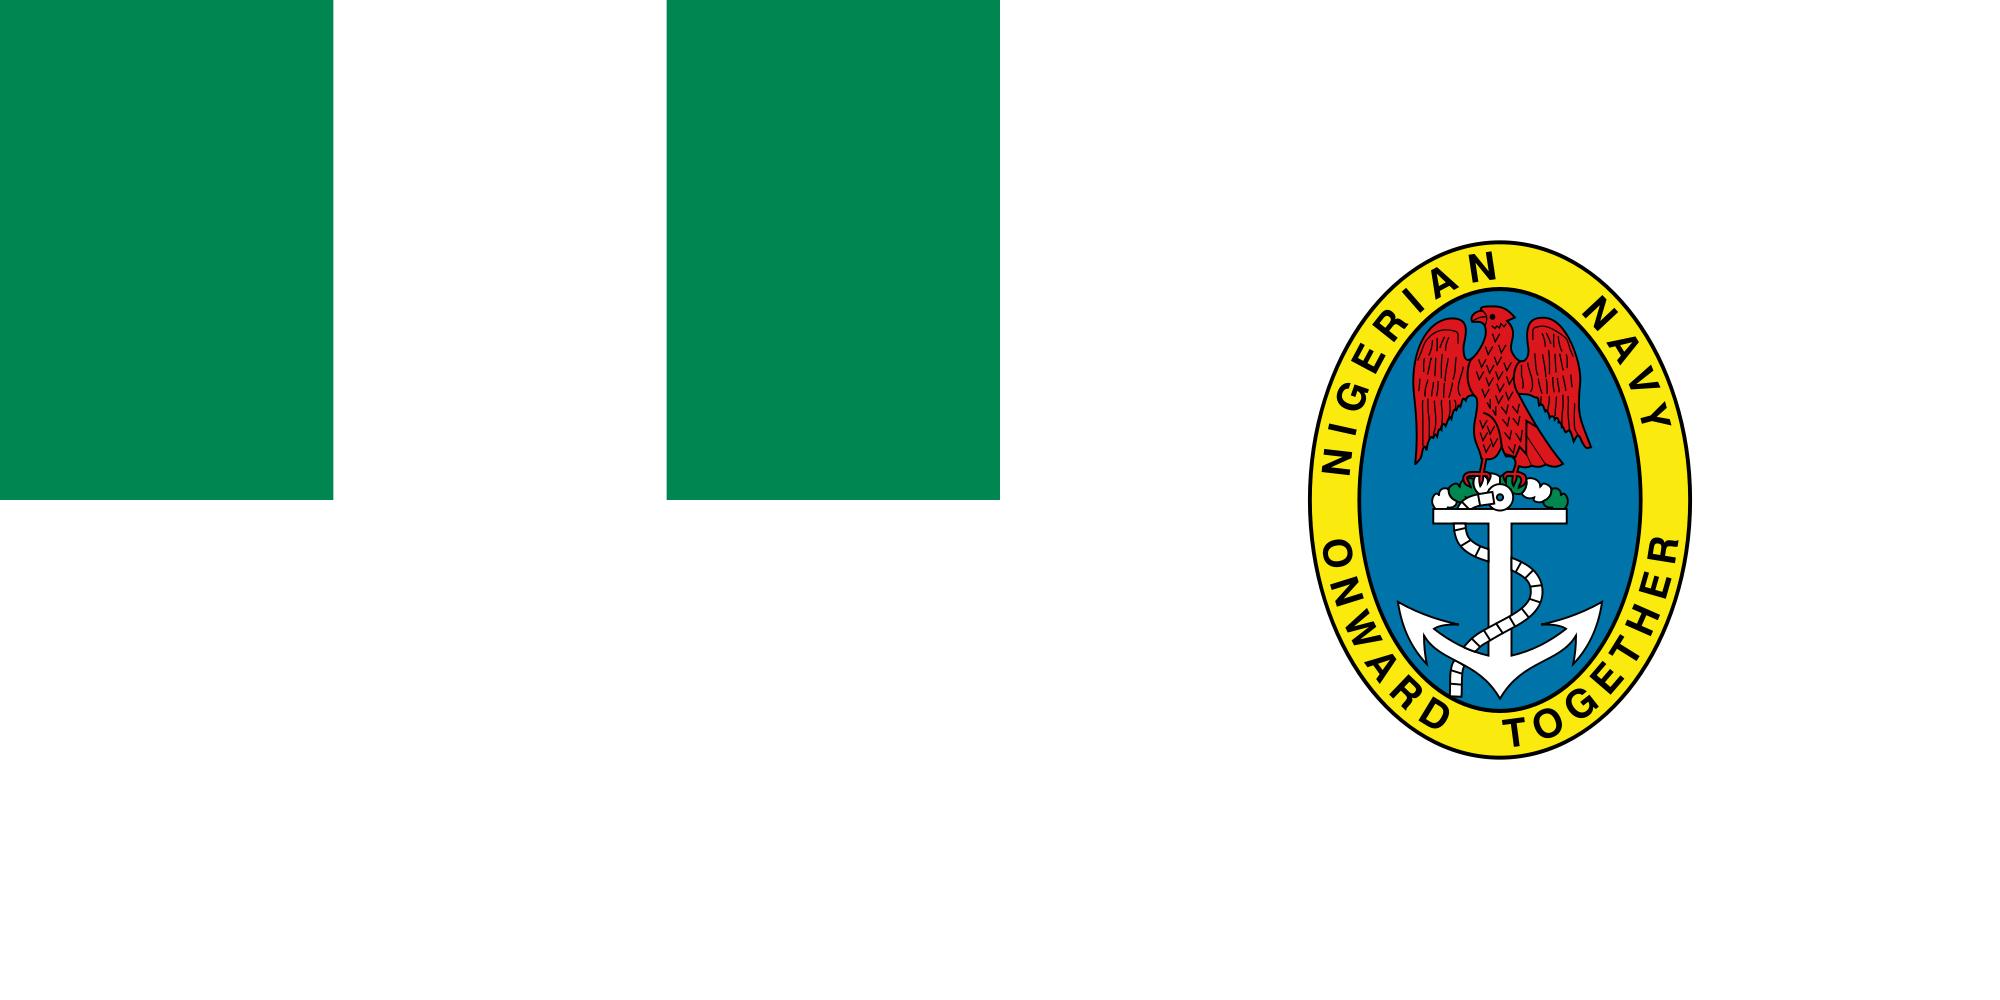 Nigeria (Naval ensign)